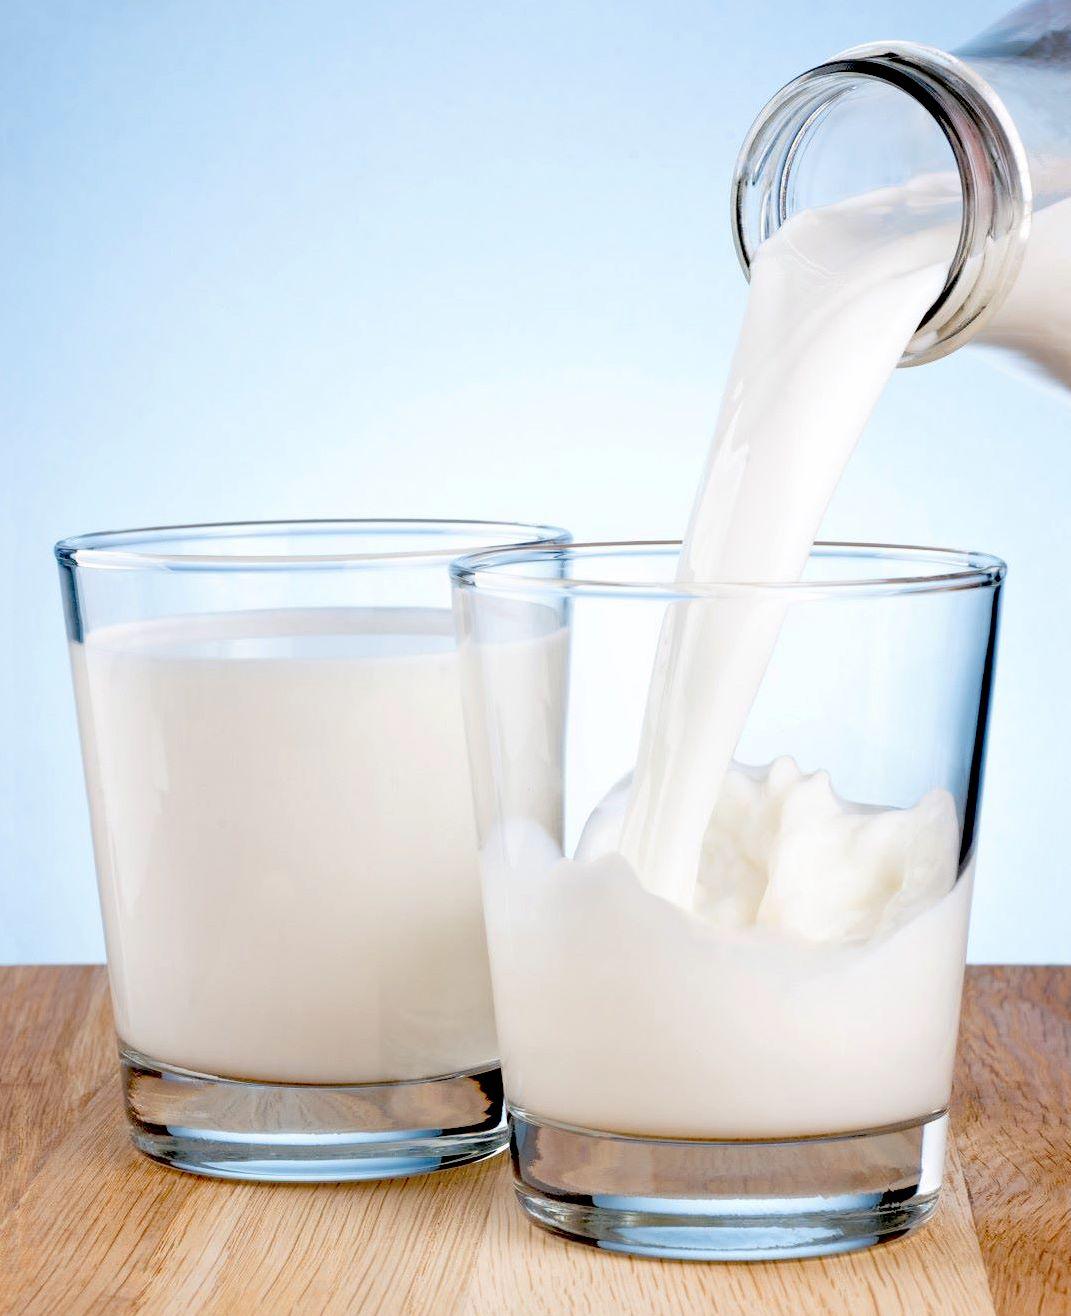 Keventer launches UHT milk